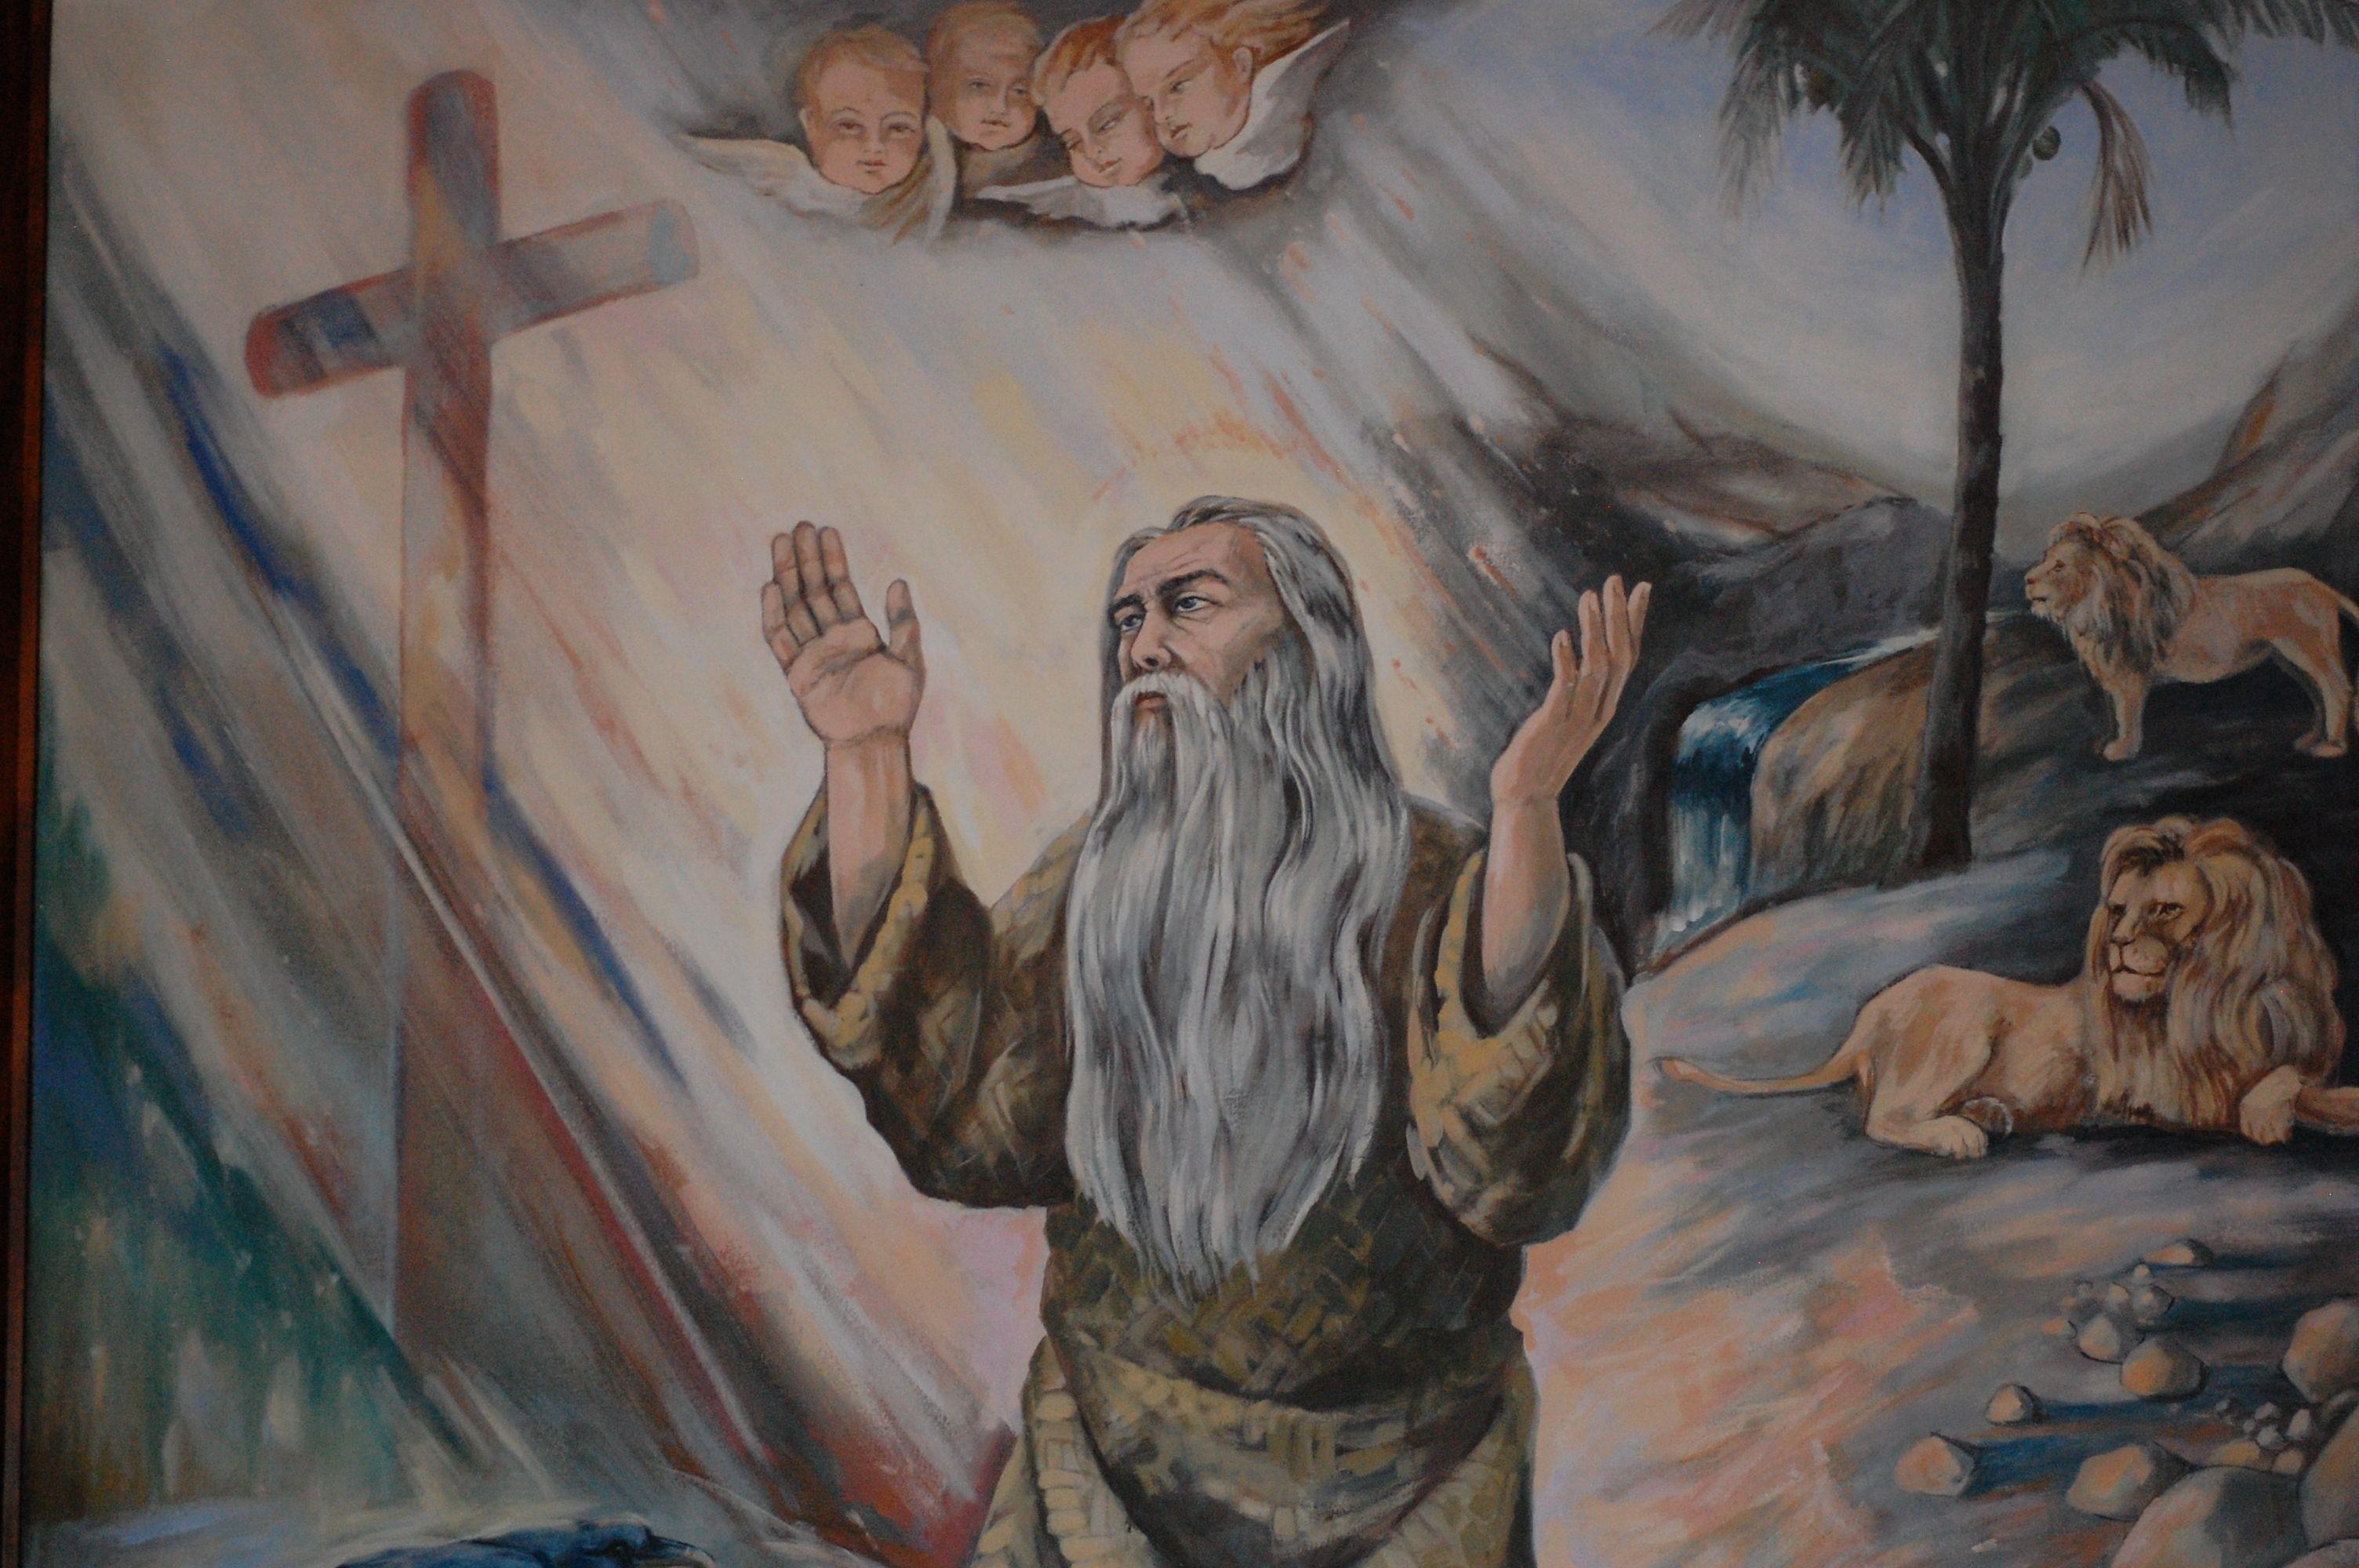 st paul - the hermit